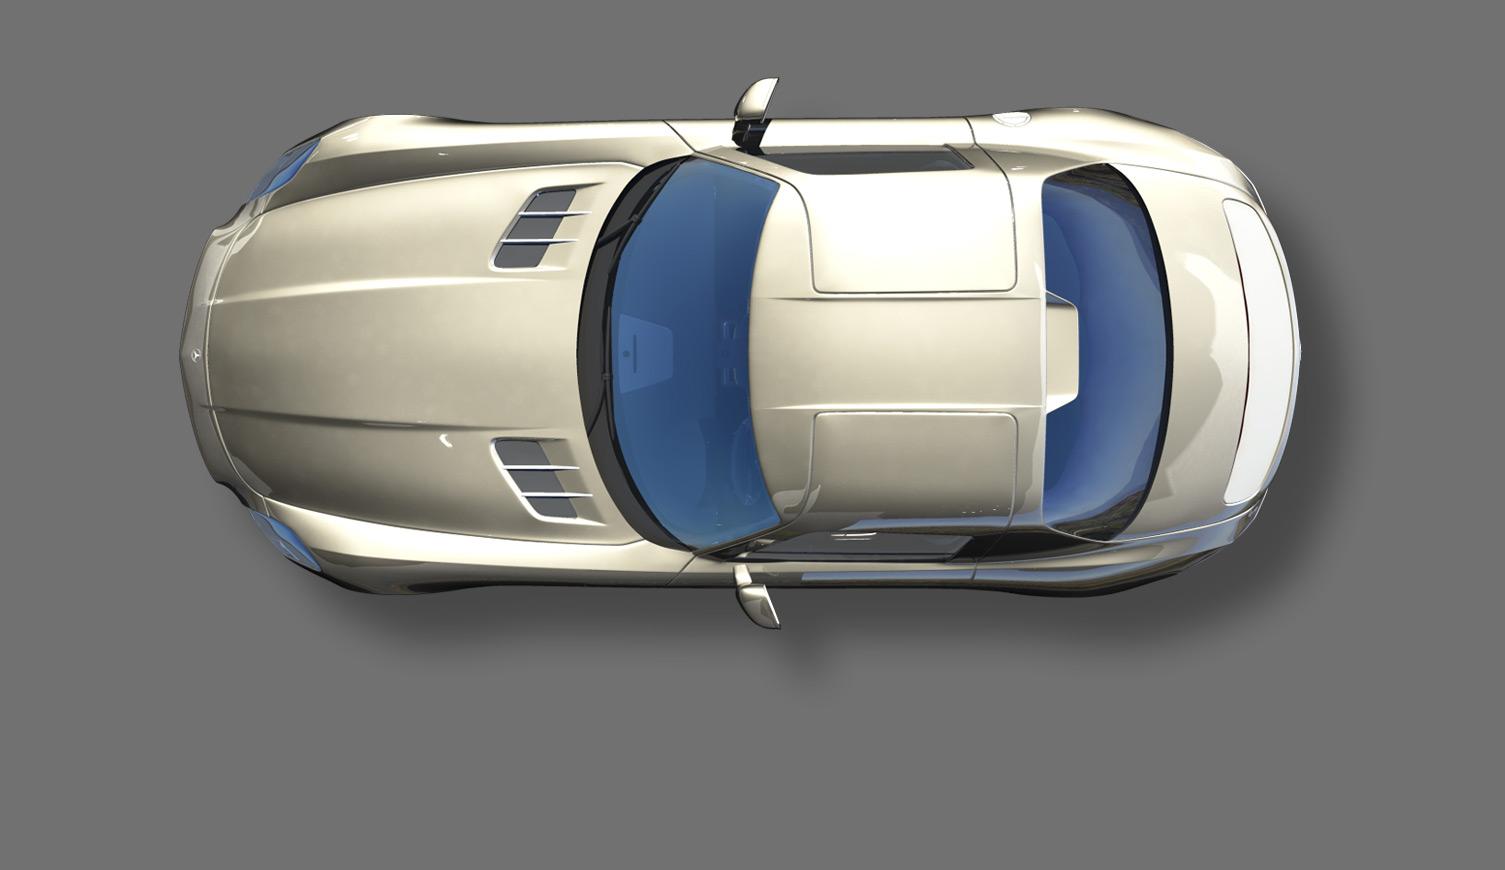 The McLaren Project